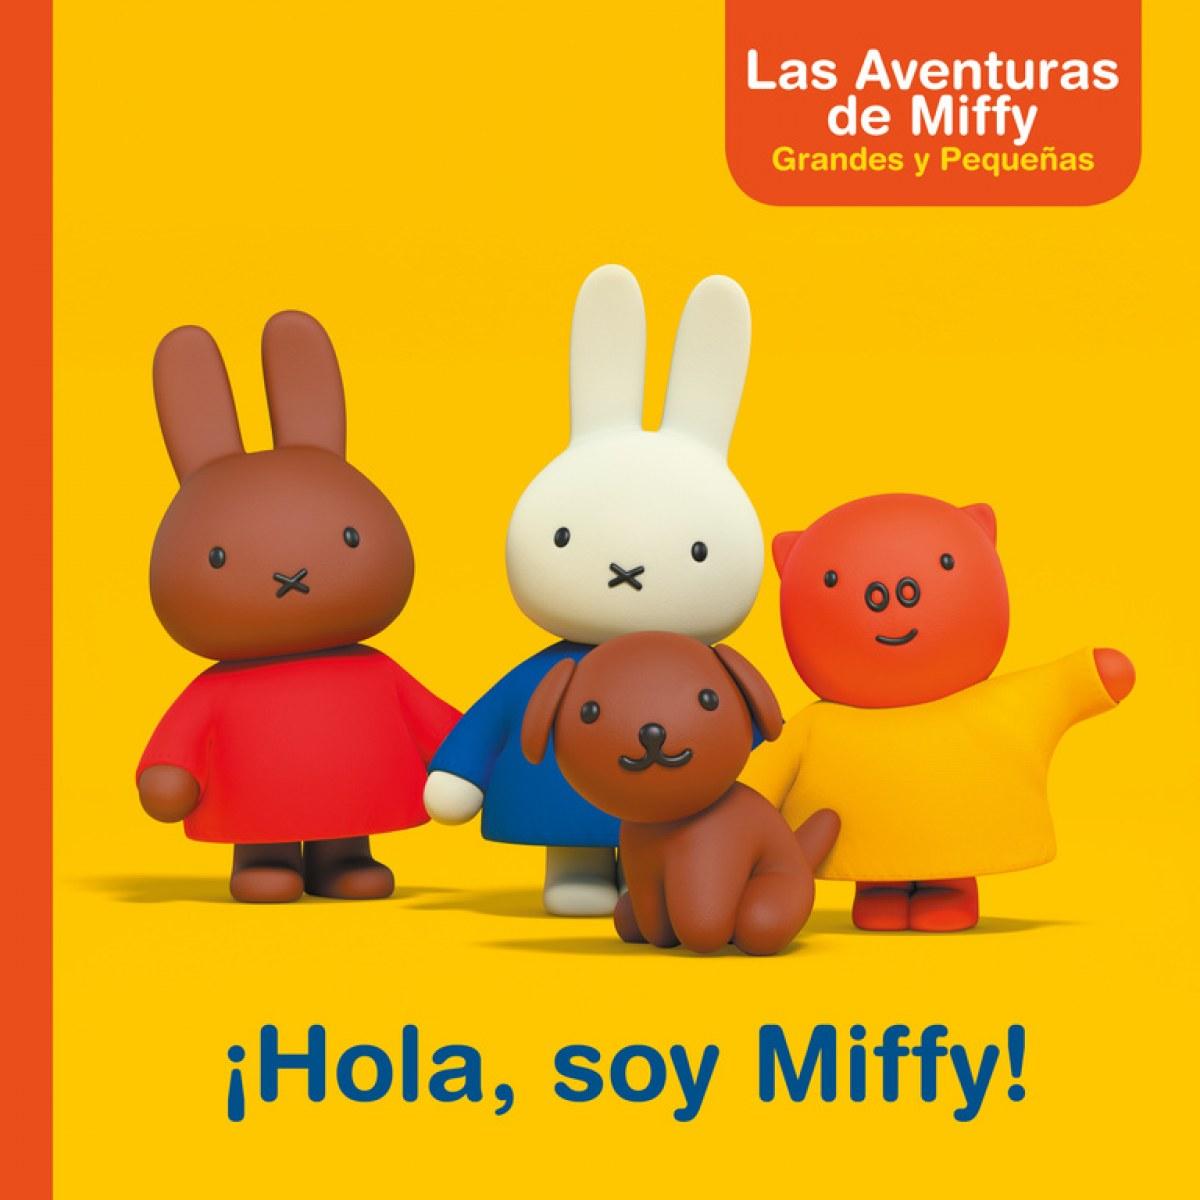 ¡HOLA, SOY MIFFY!